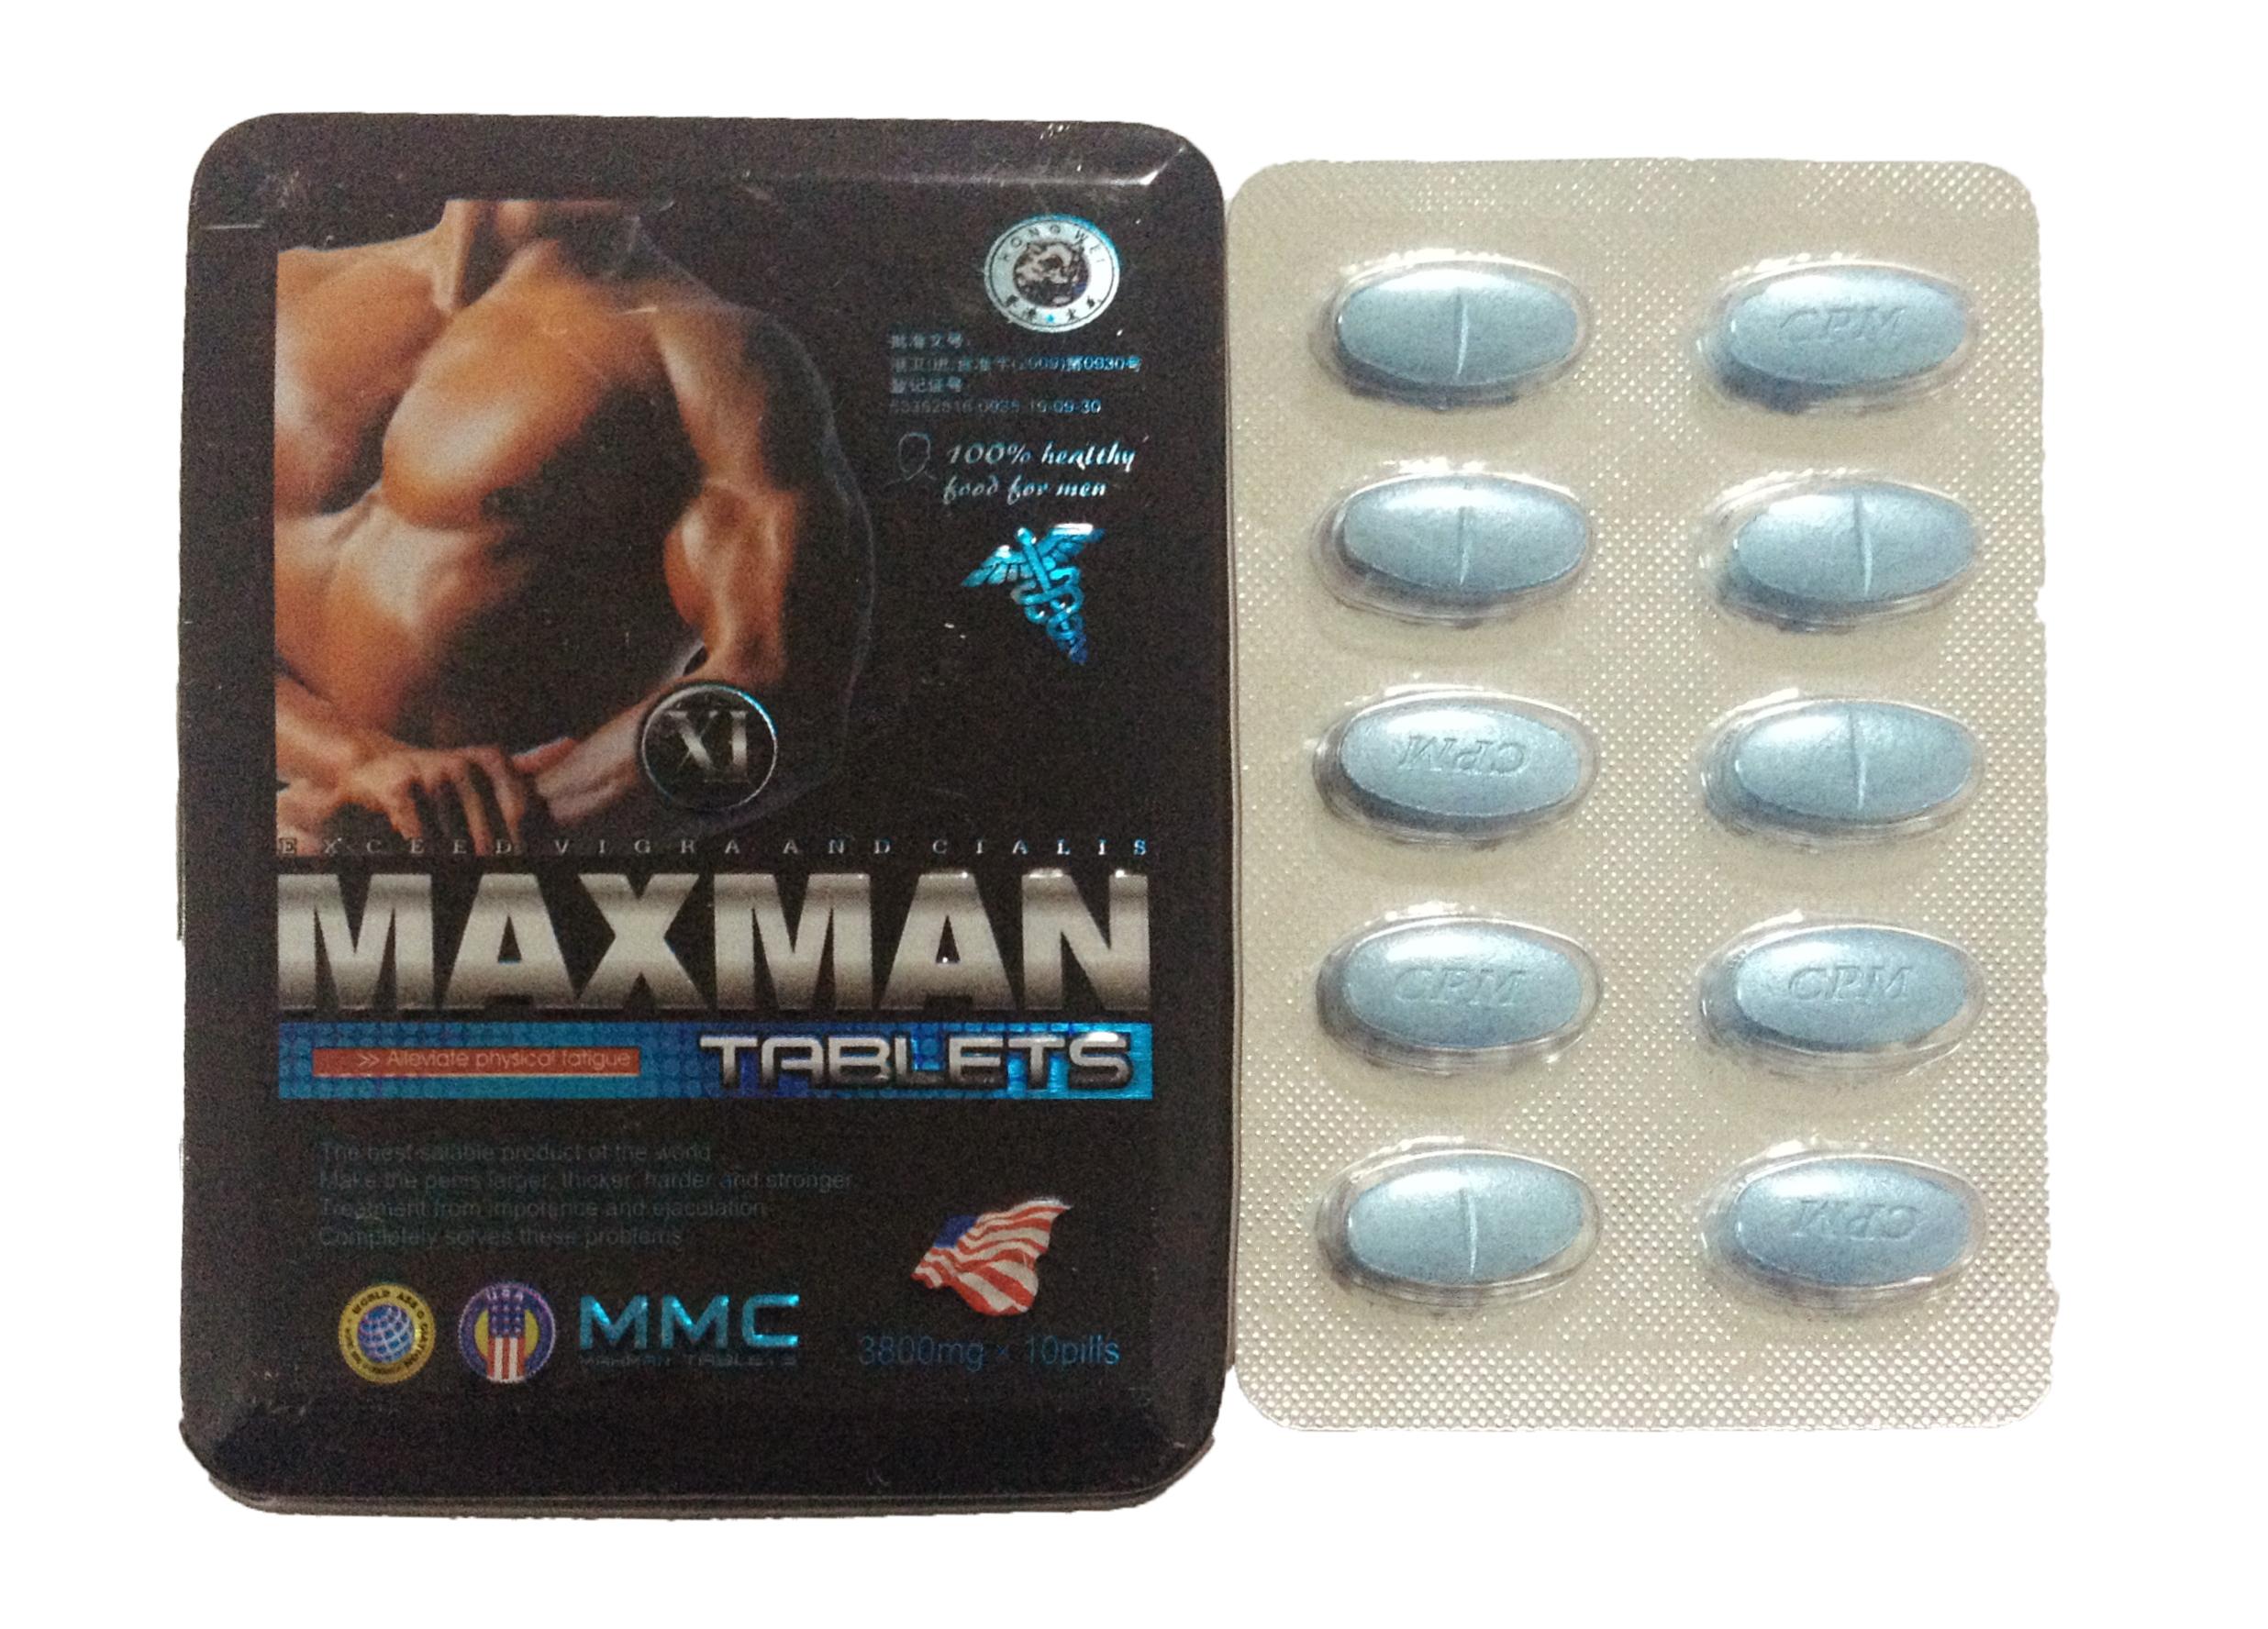 Maxman xi 3800mg